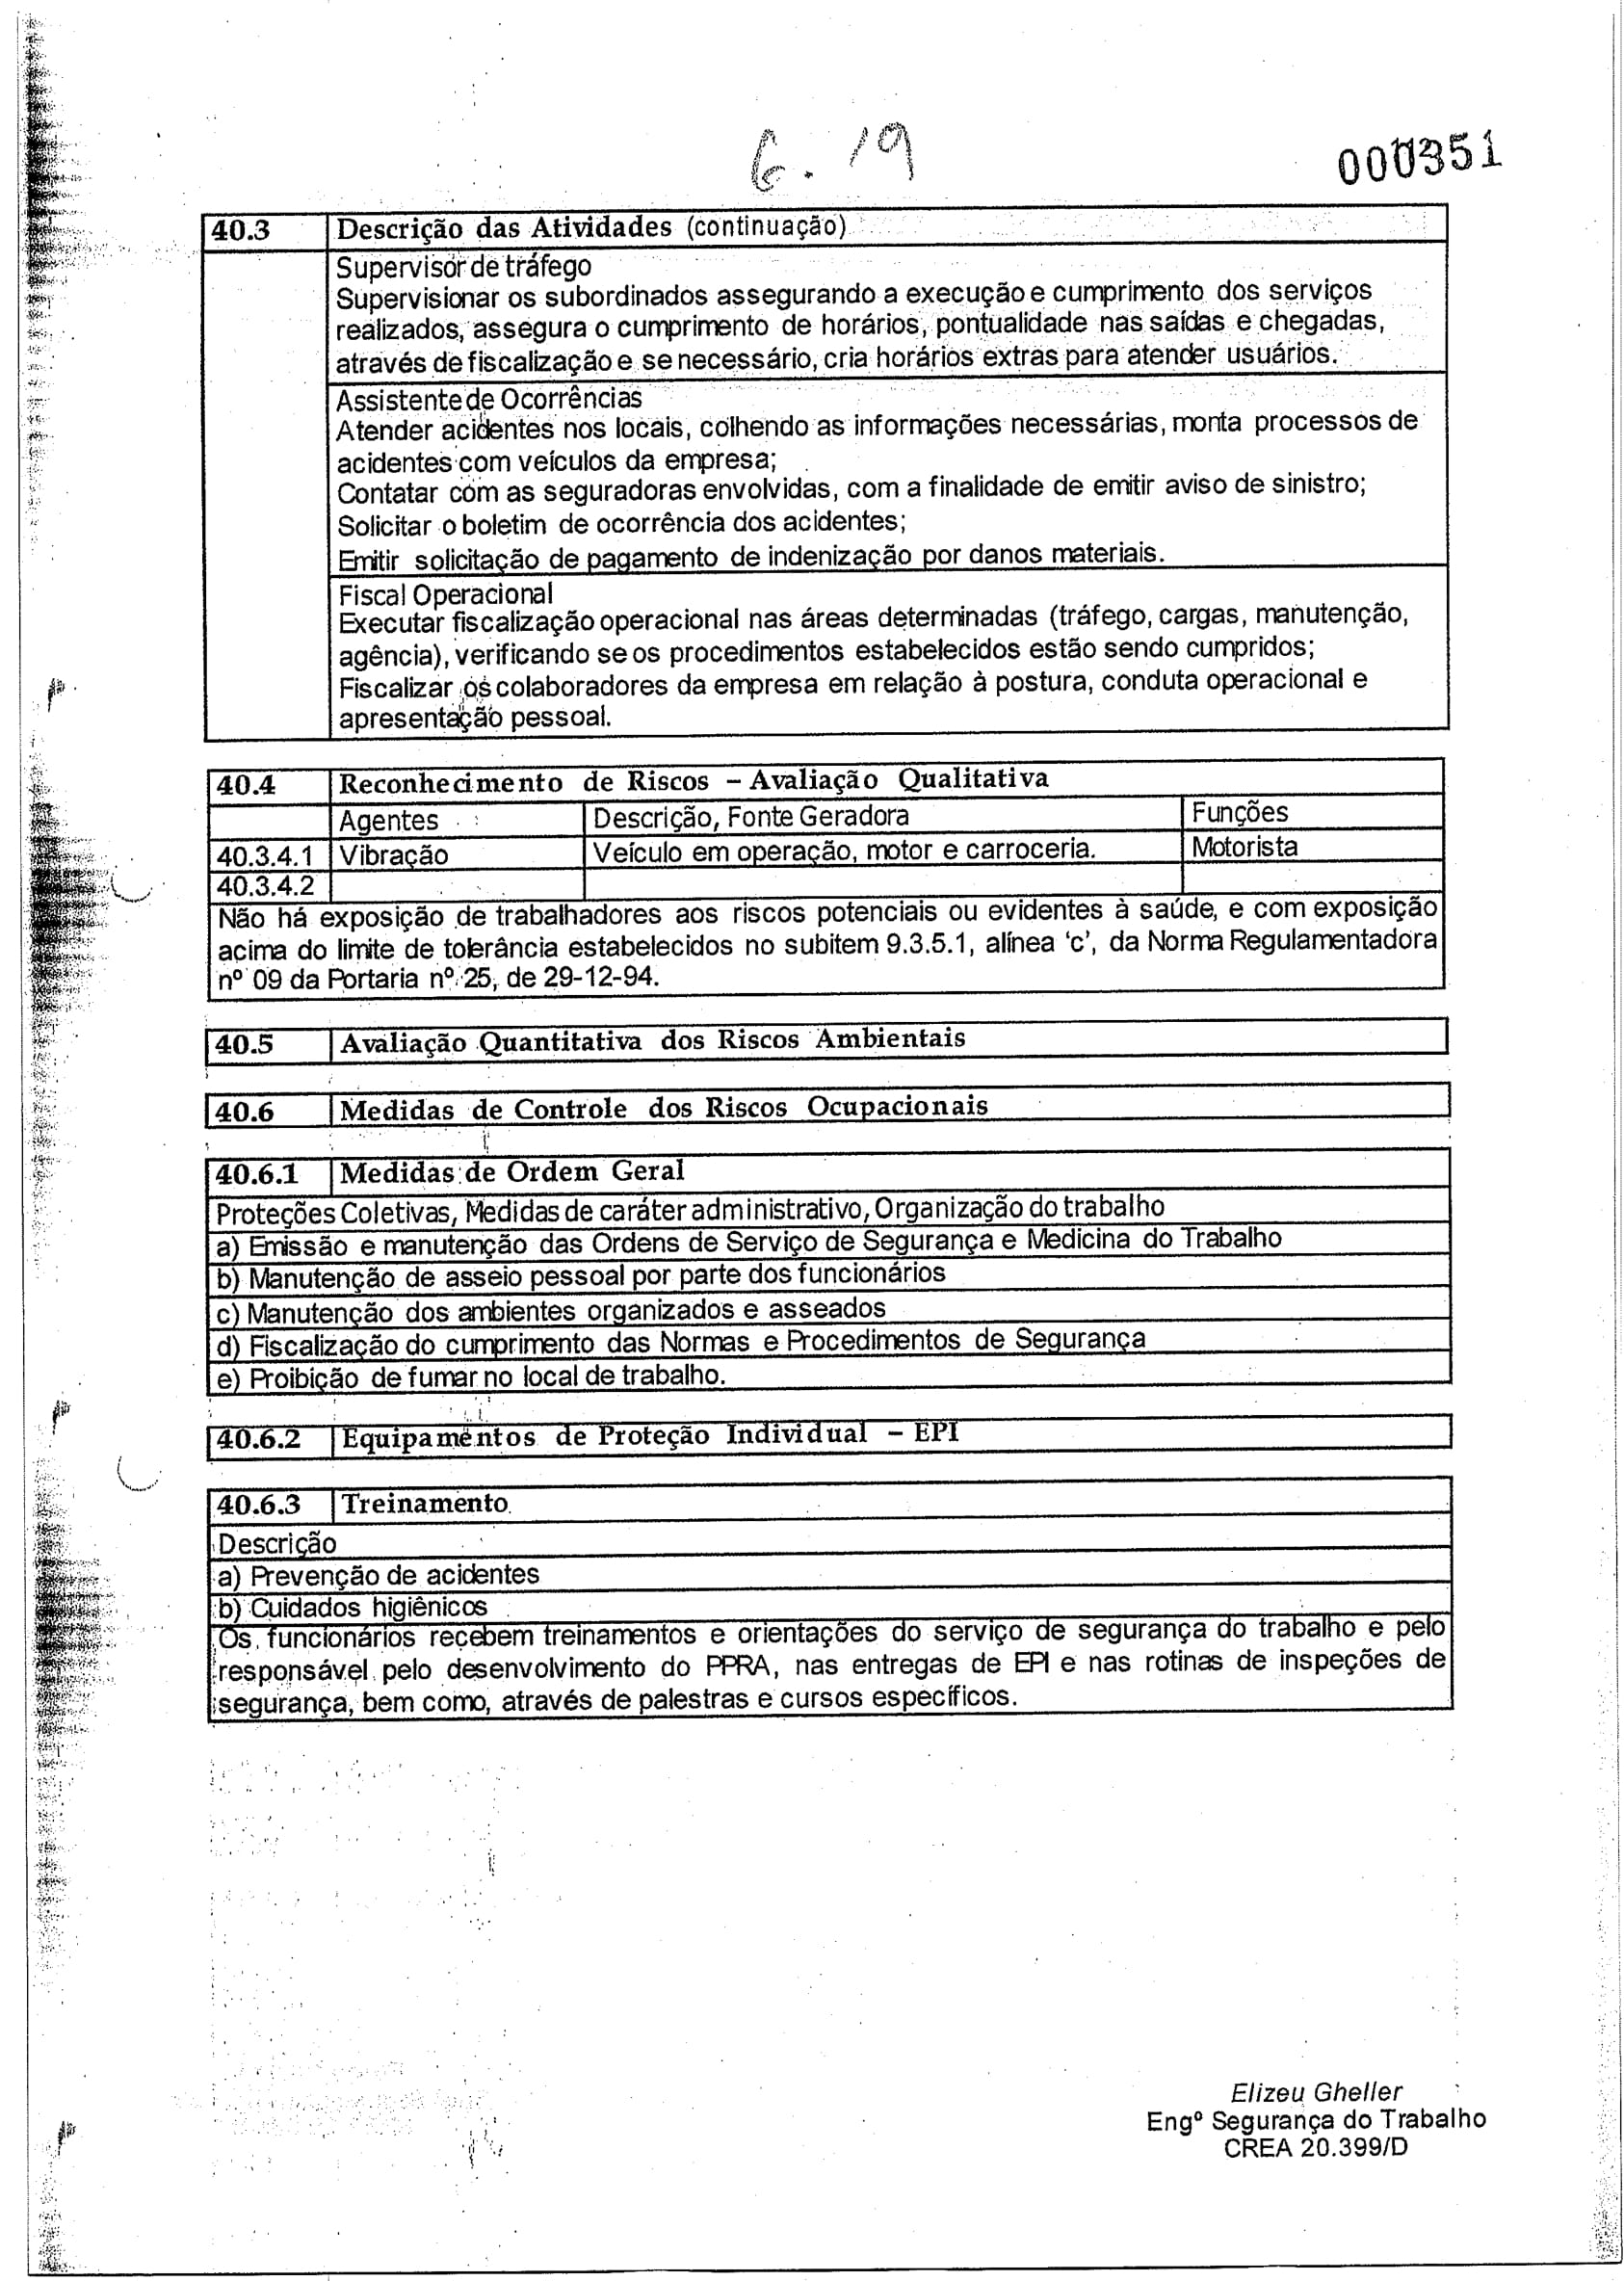 PL001222019-266